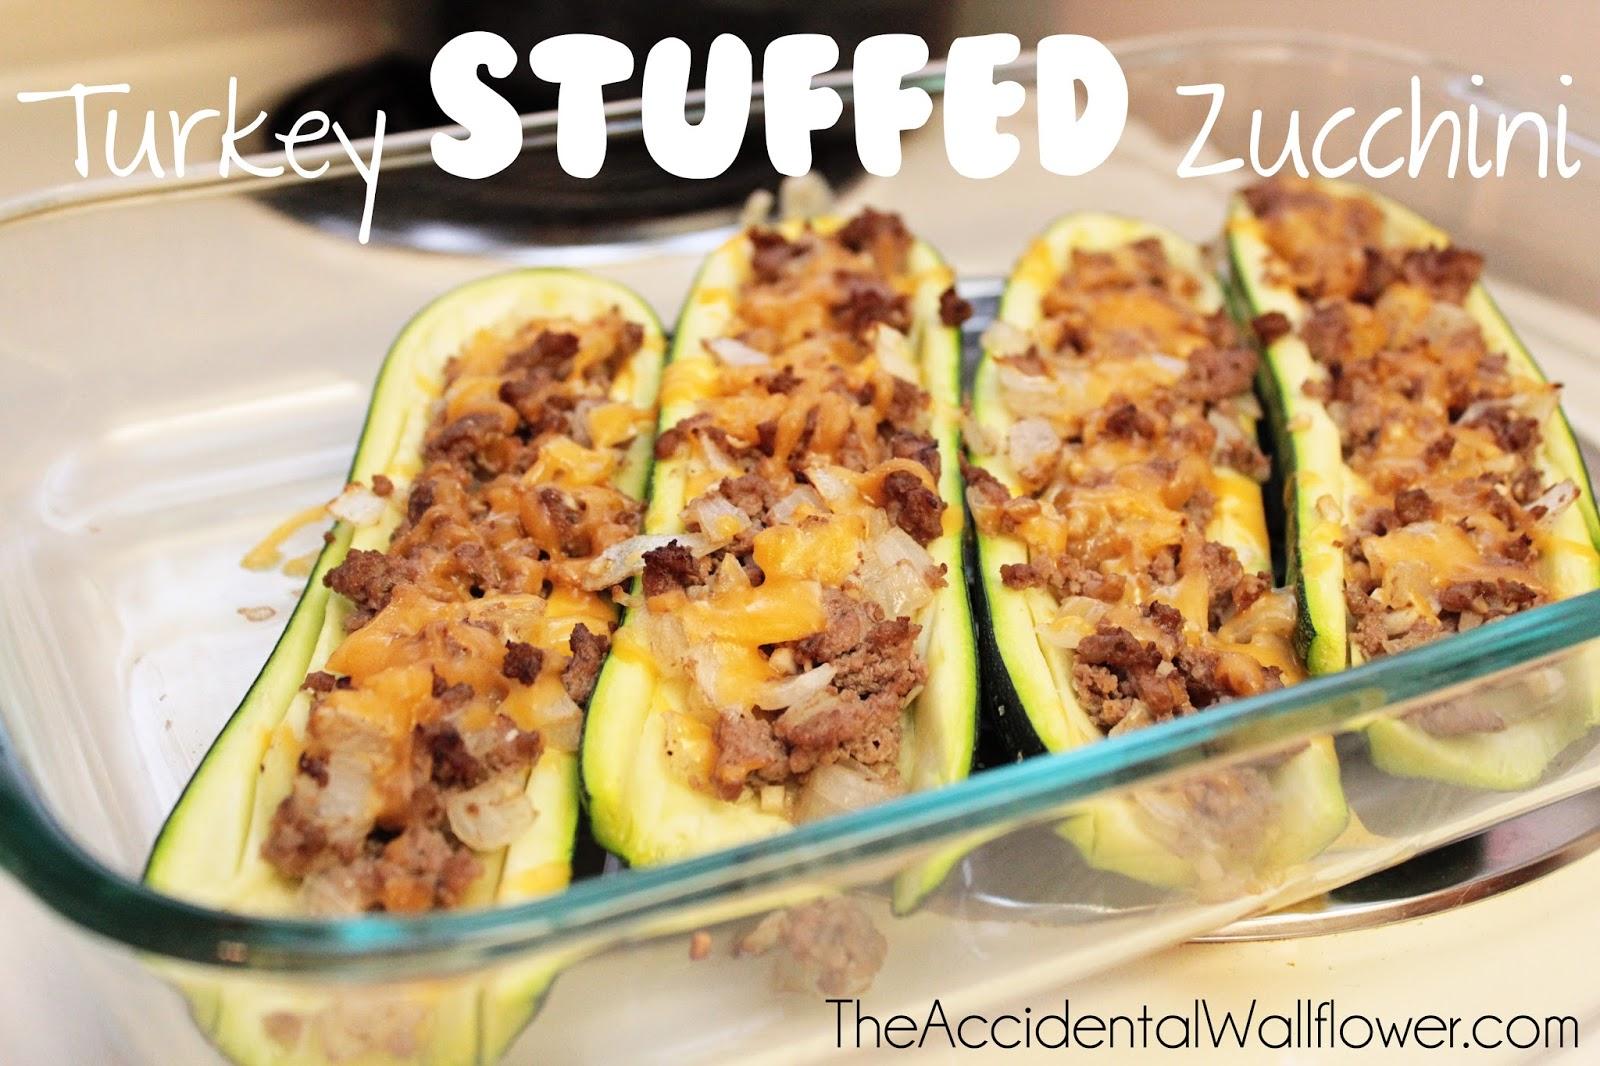 turkey stuffed zucchini serves 2 4 ingredients 2 large zucchinis